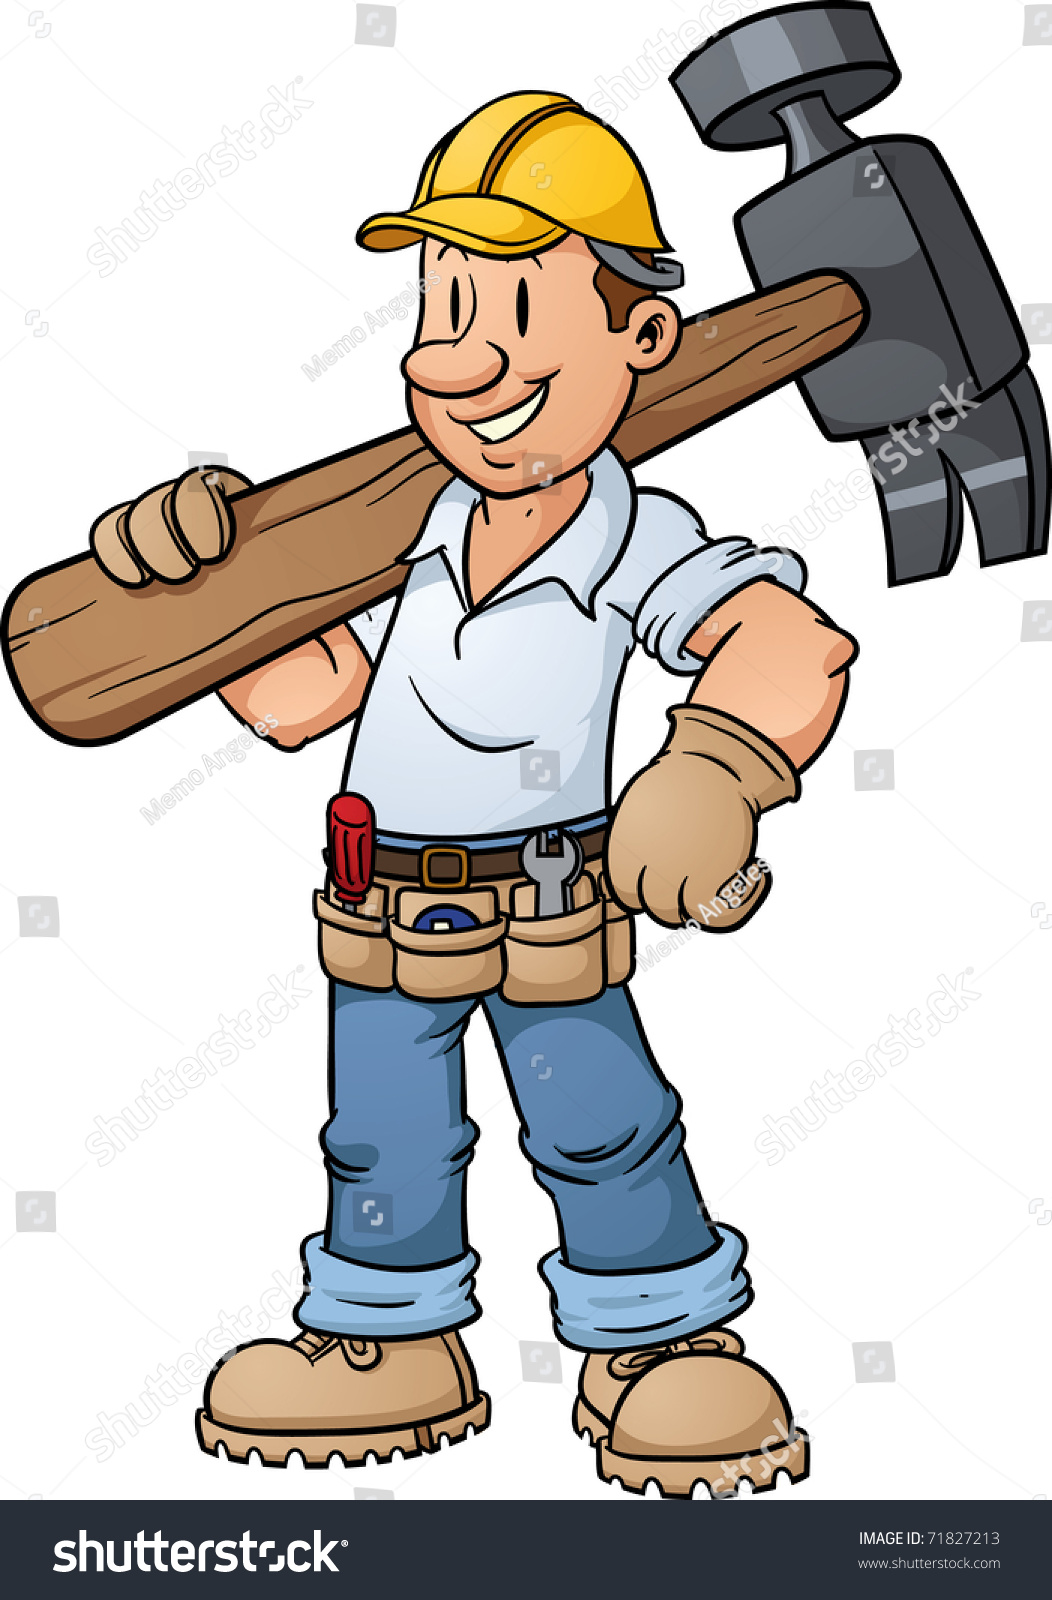 Cartoon Construction Worker Carrying Big Hammer Stock Vector ...